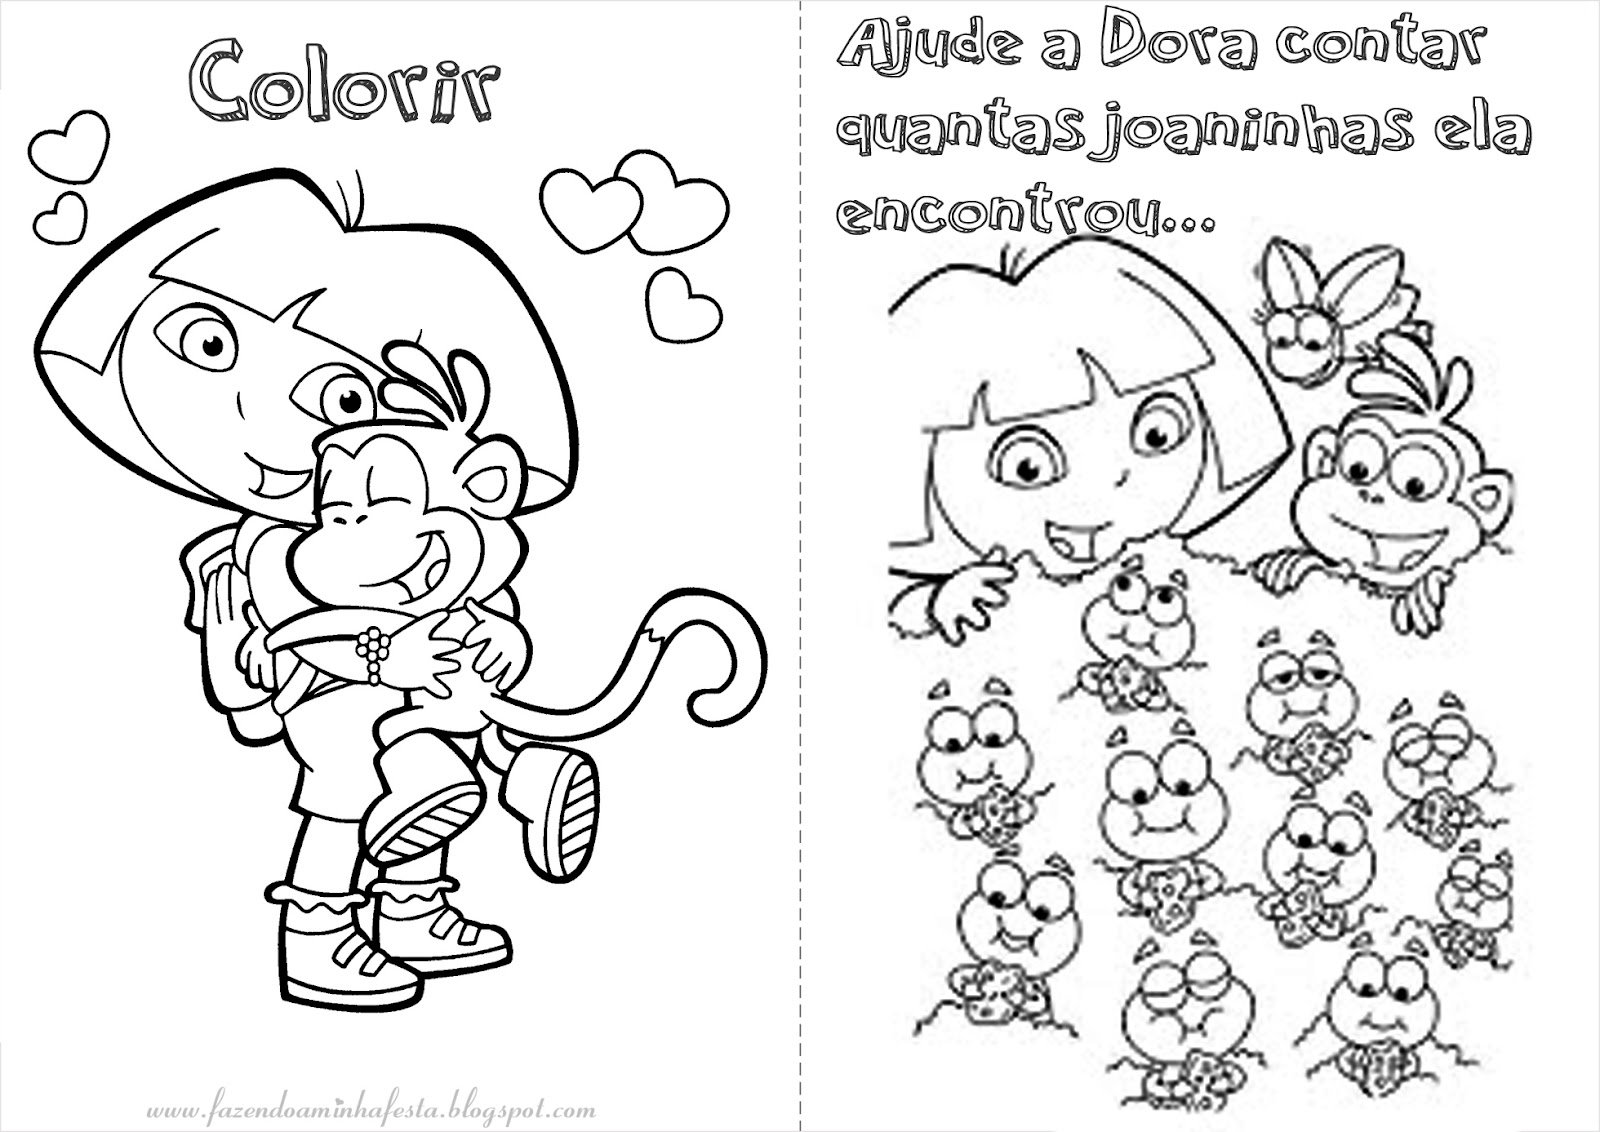 Atividades De Colorir